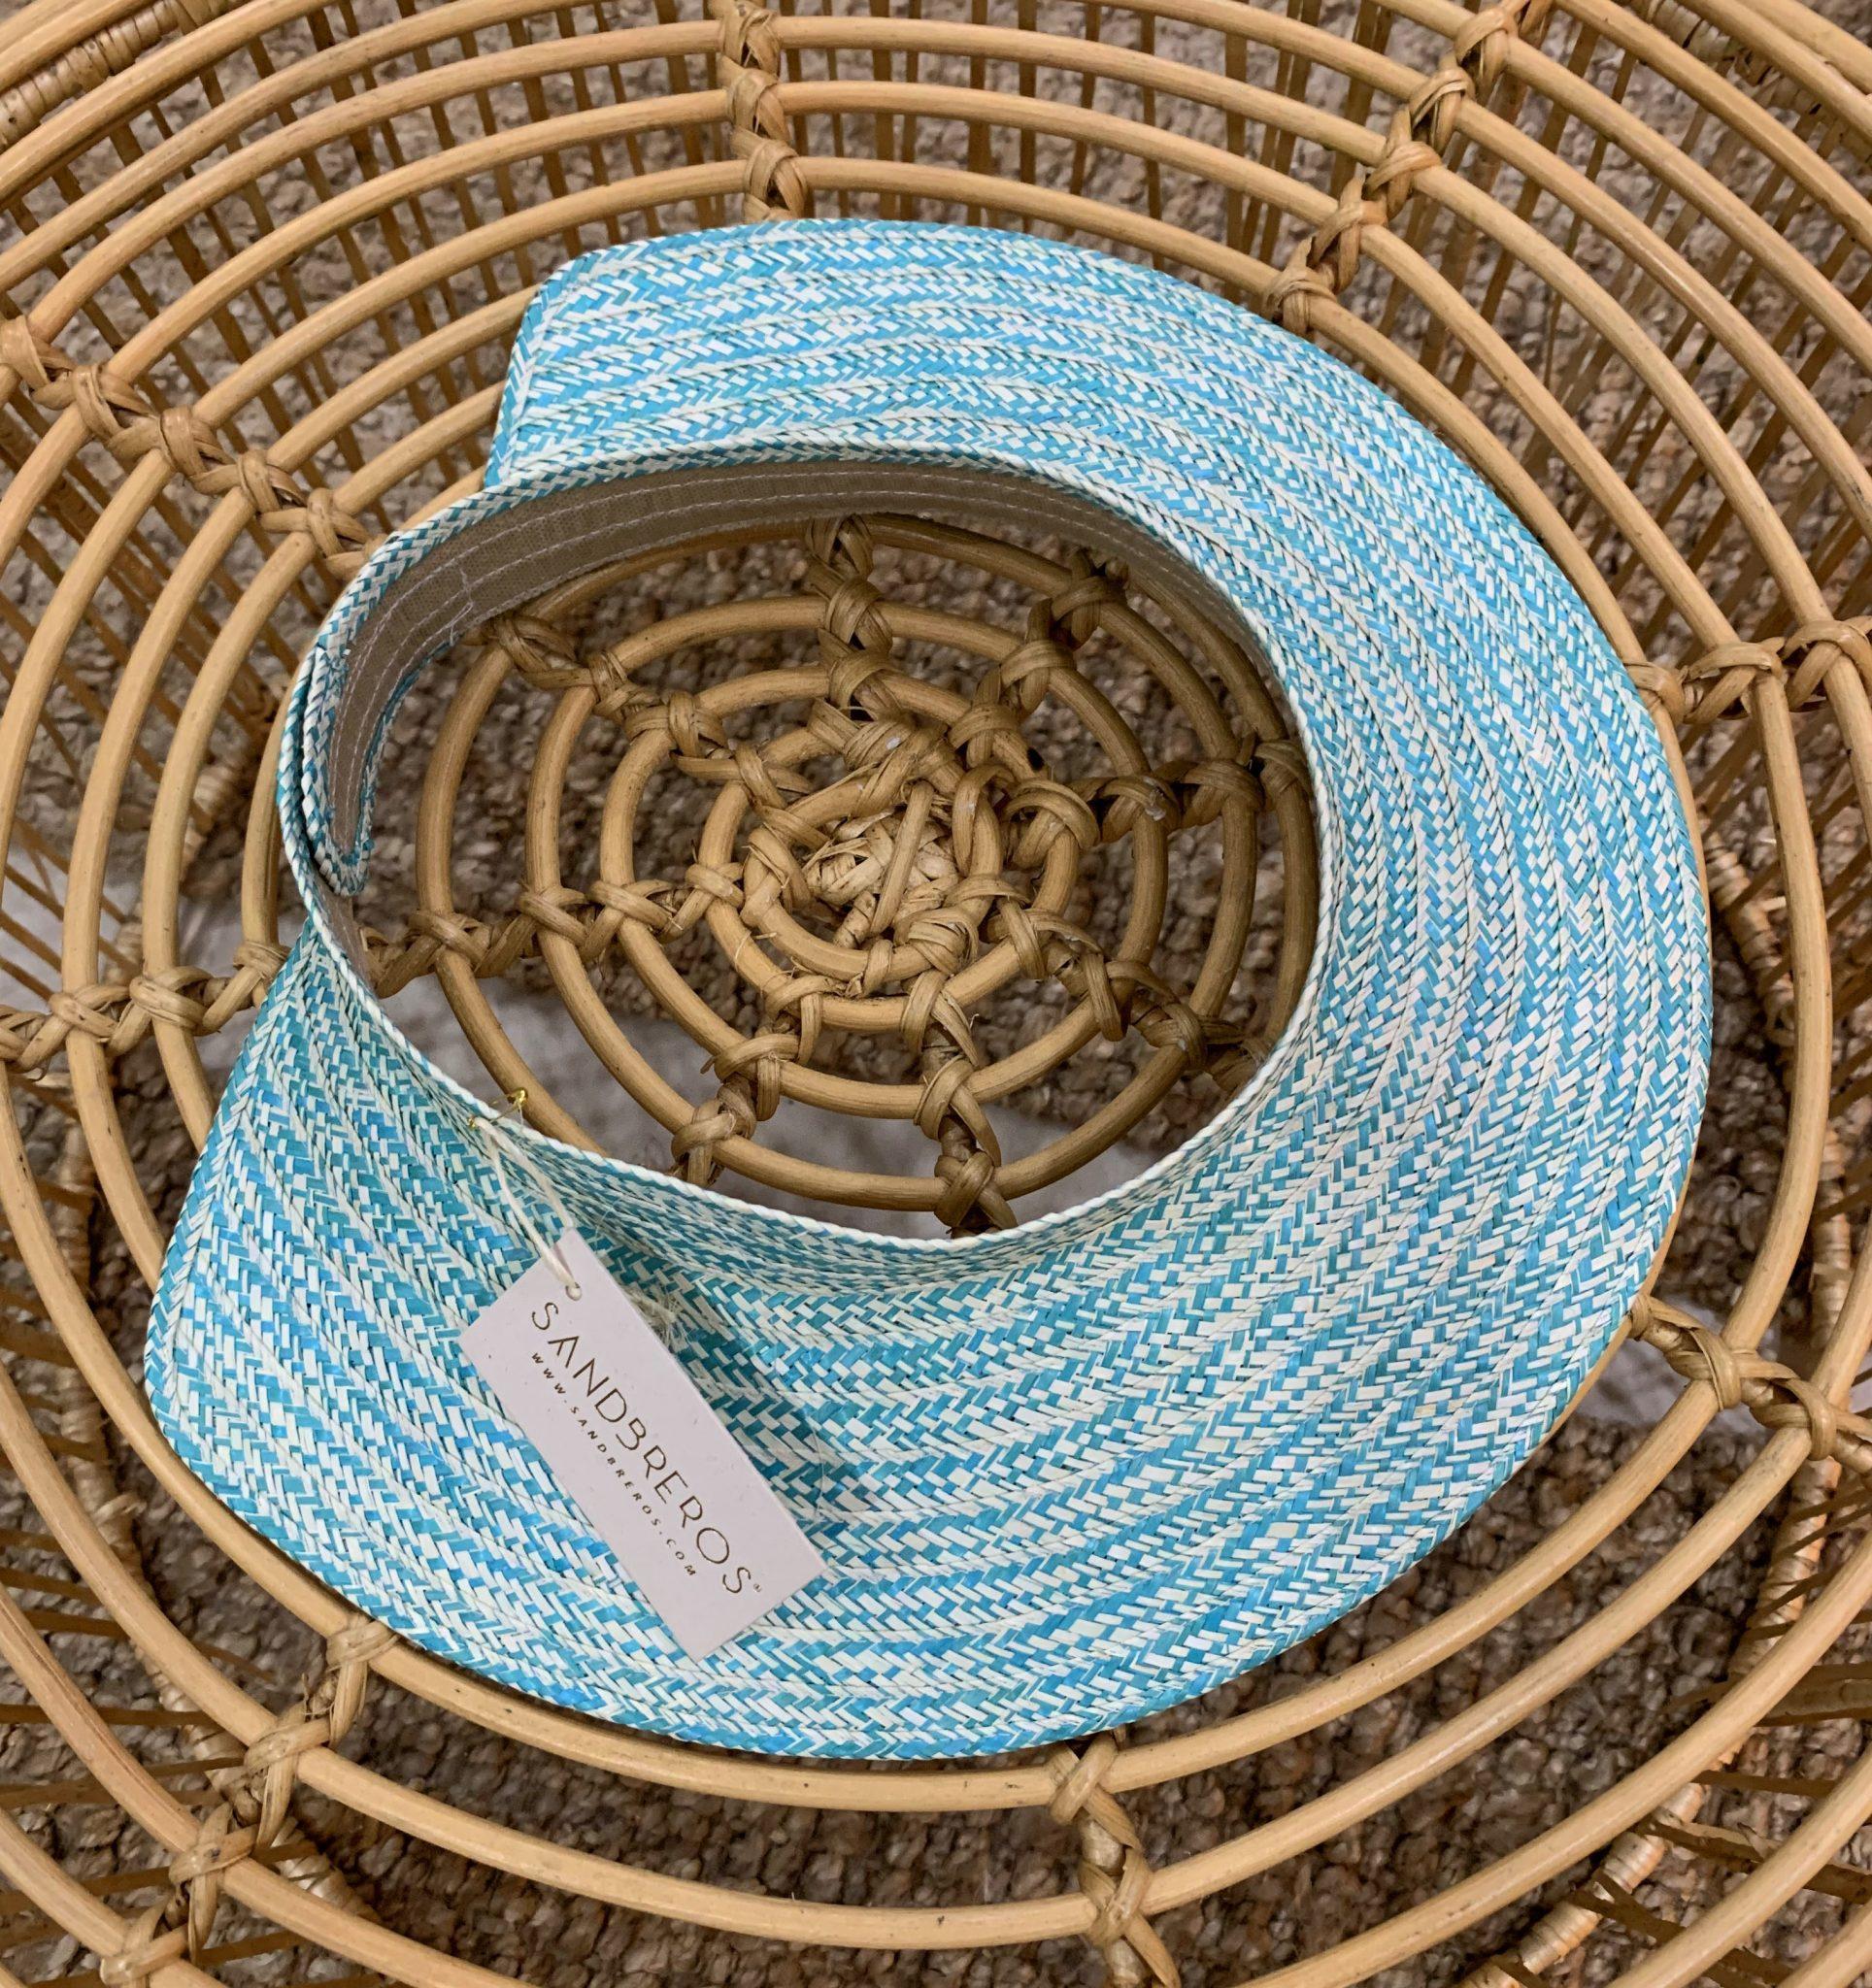 visor blue sandbreros hecho en caña flecha colombiano 100%